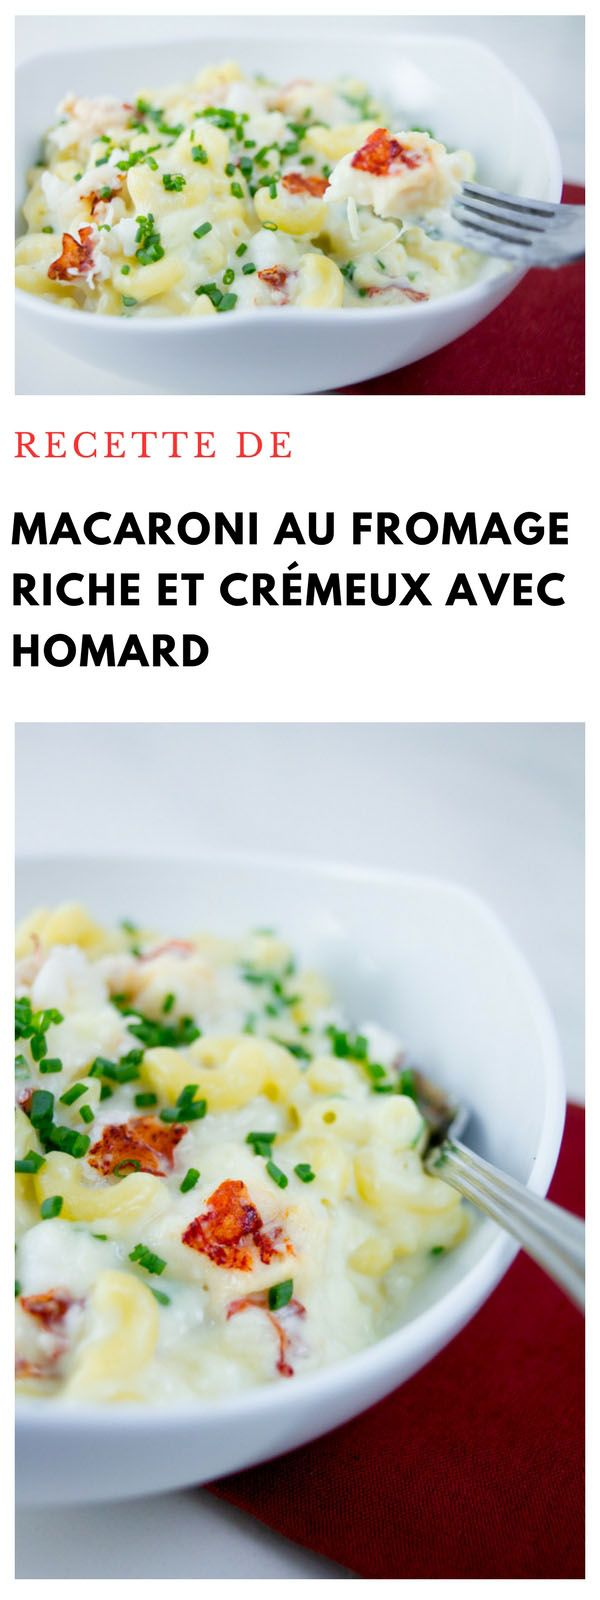 #macaroni #fromage #crémeux #homard